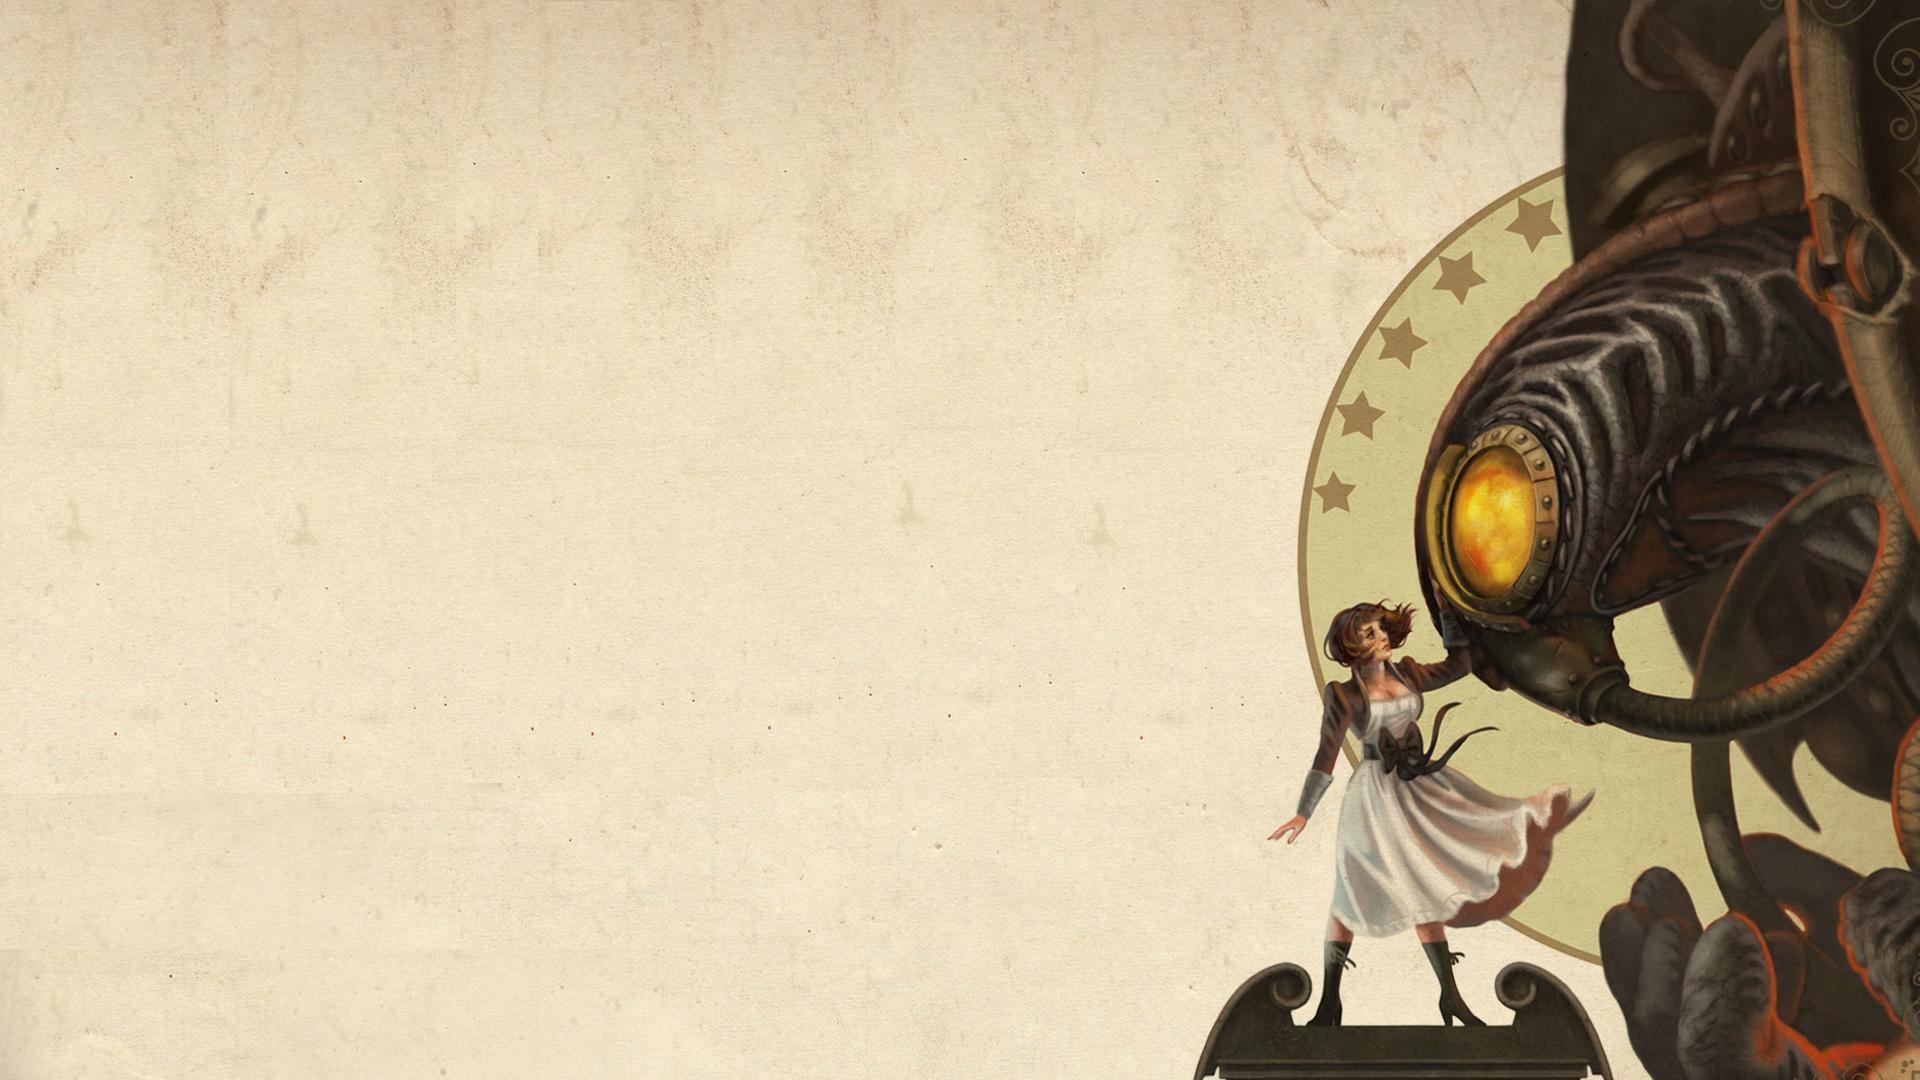 Bioshock Infinite Wallpaper (Minus the logo) …